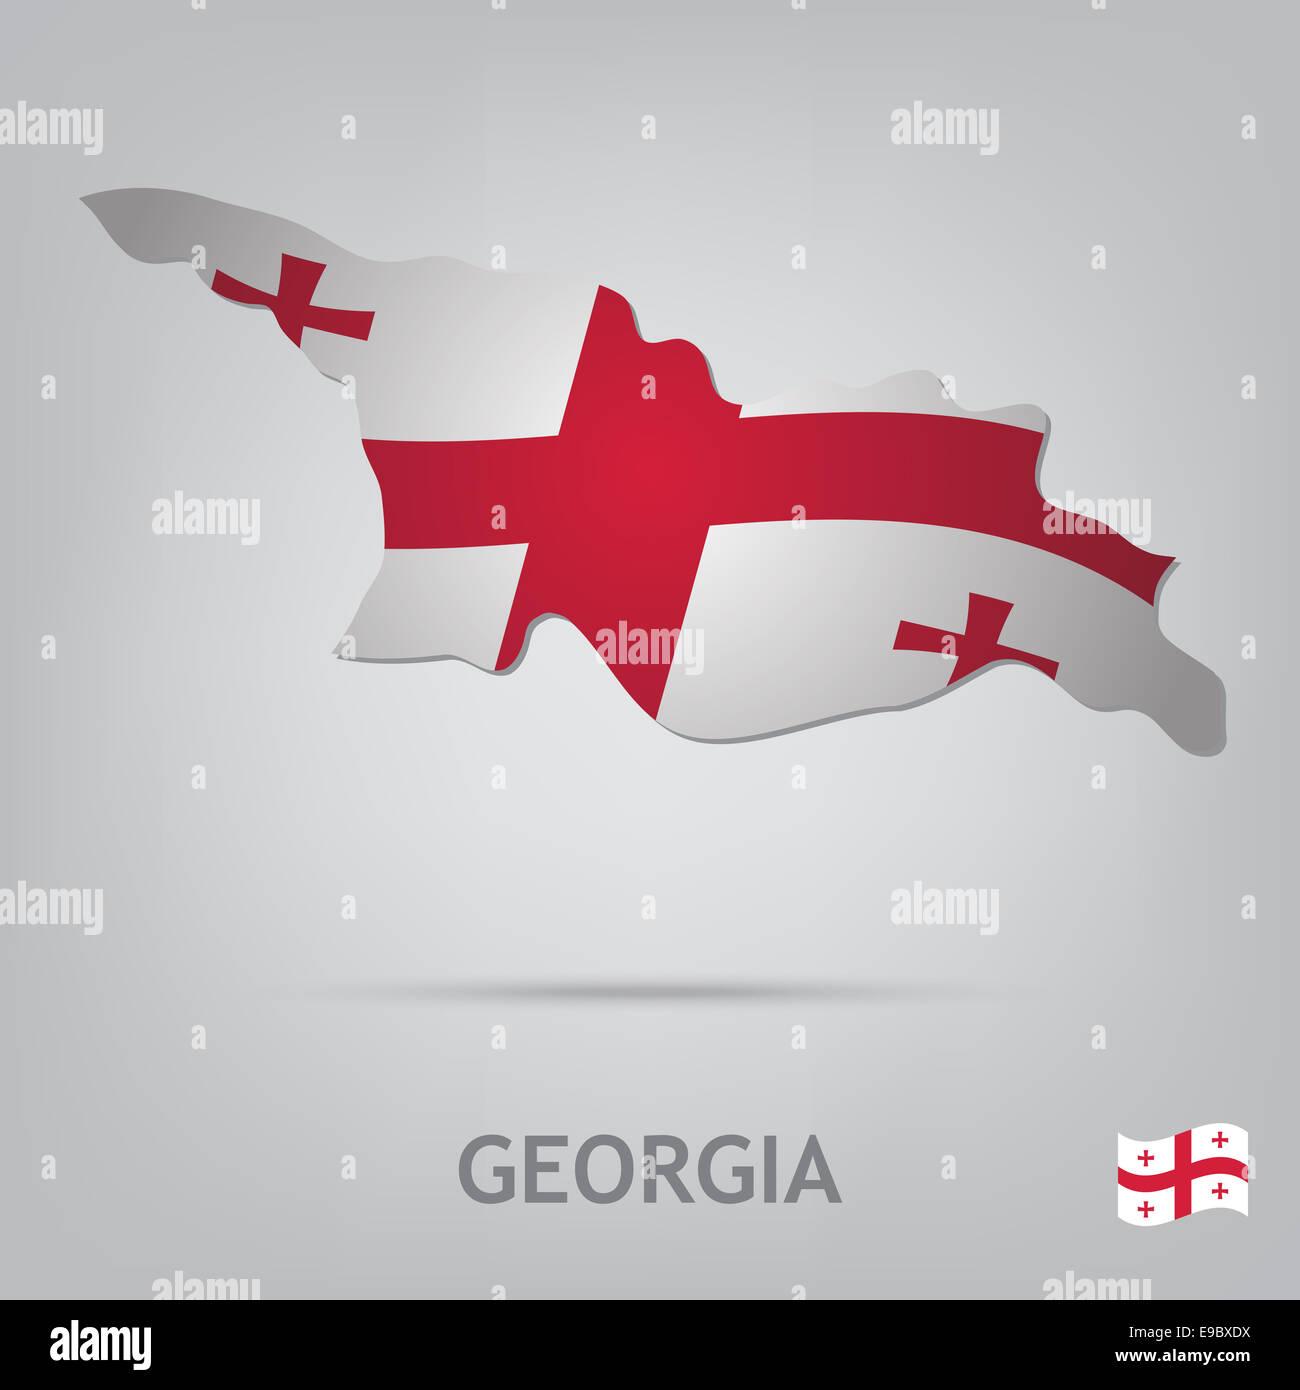 georgia - Stock Image